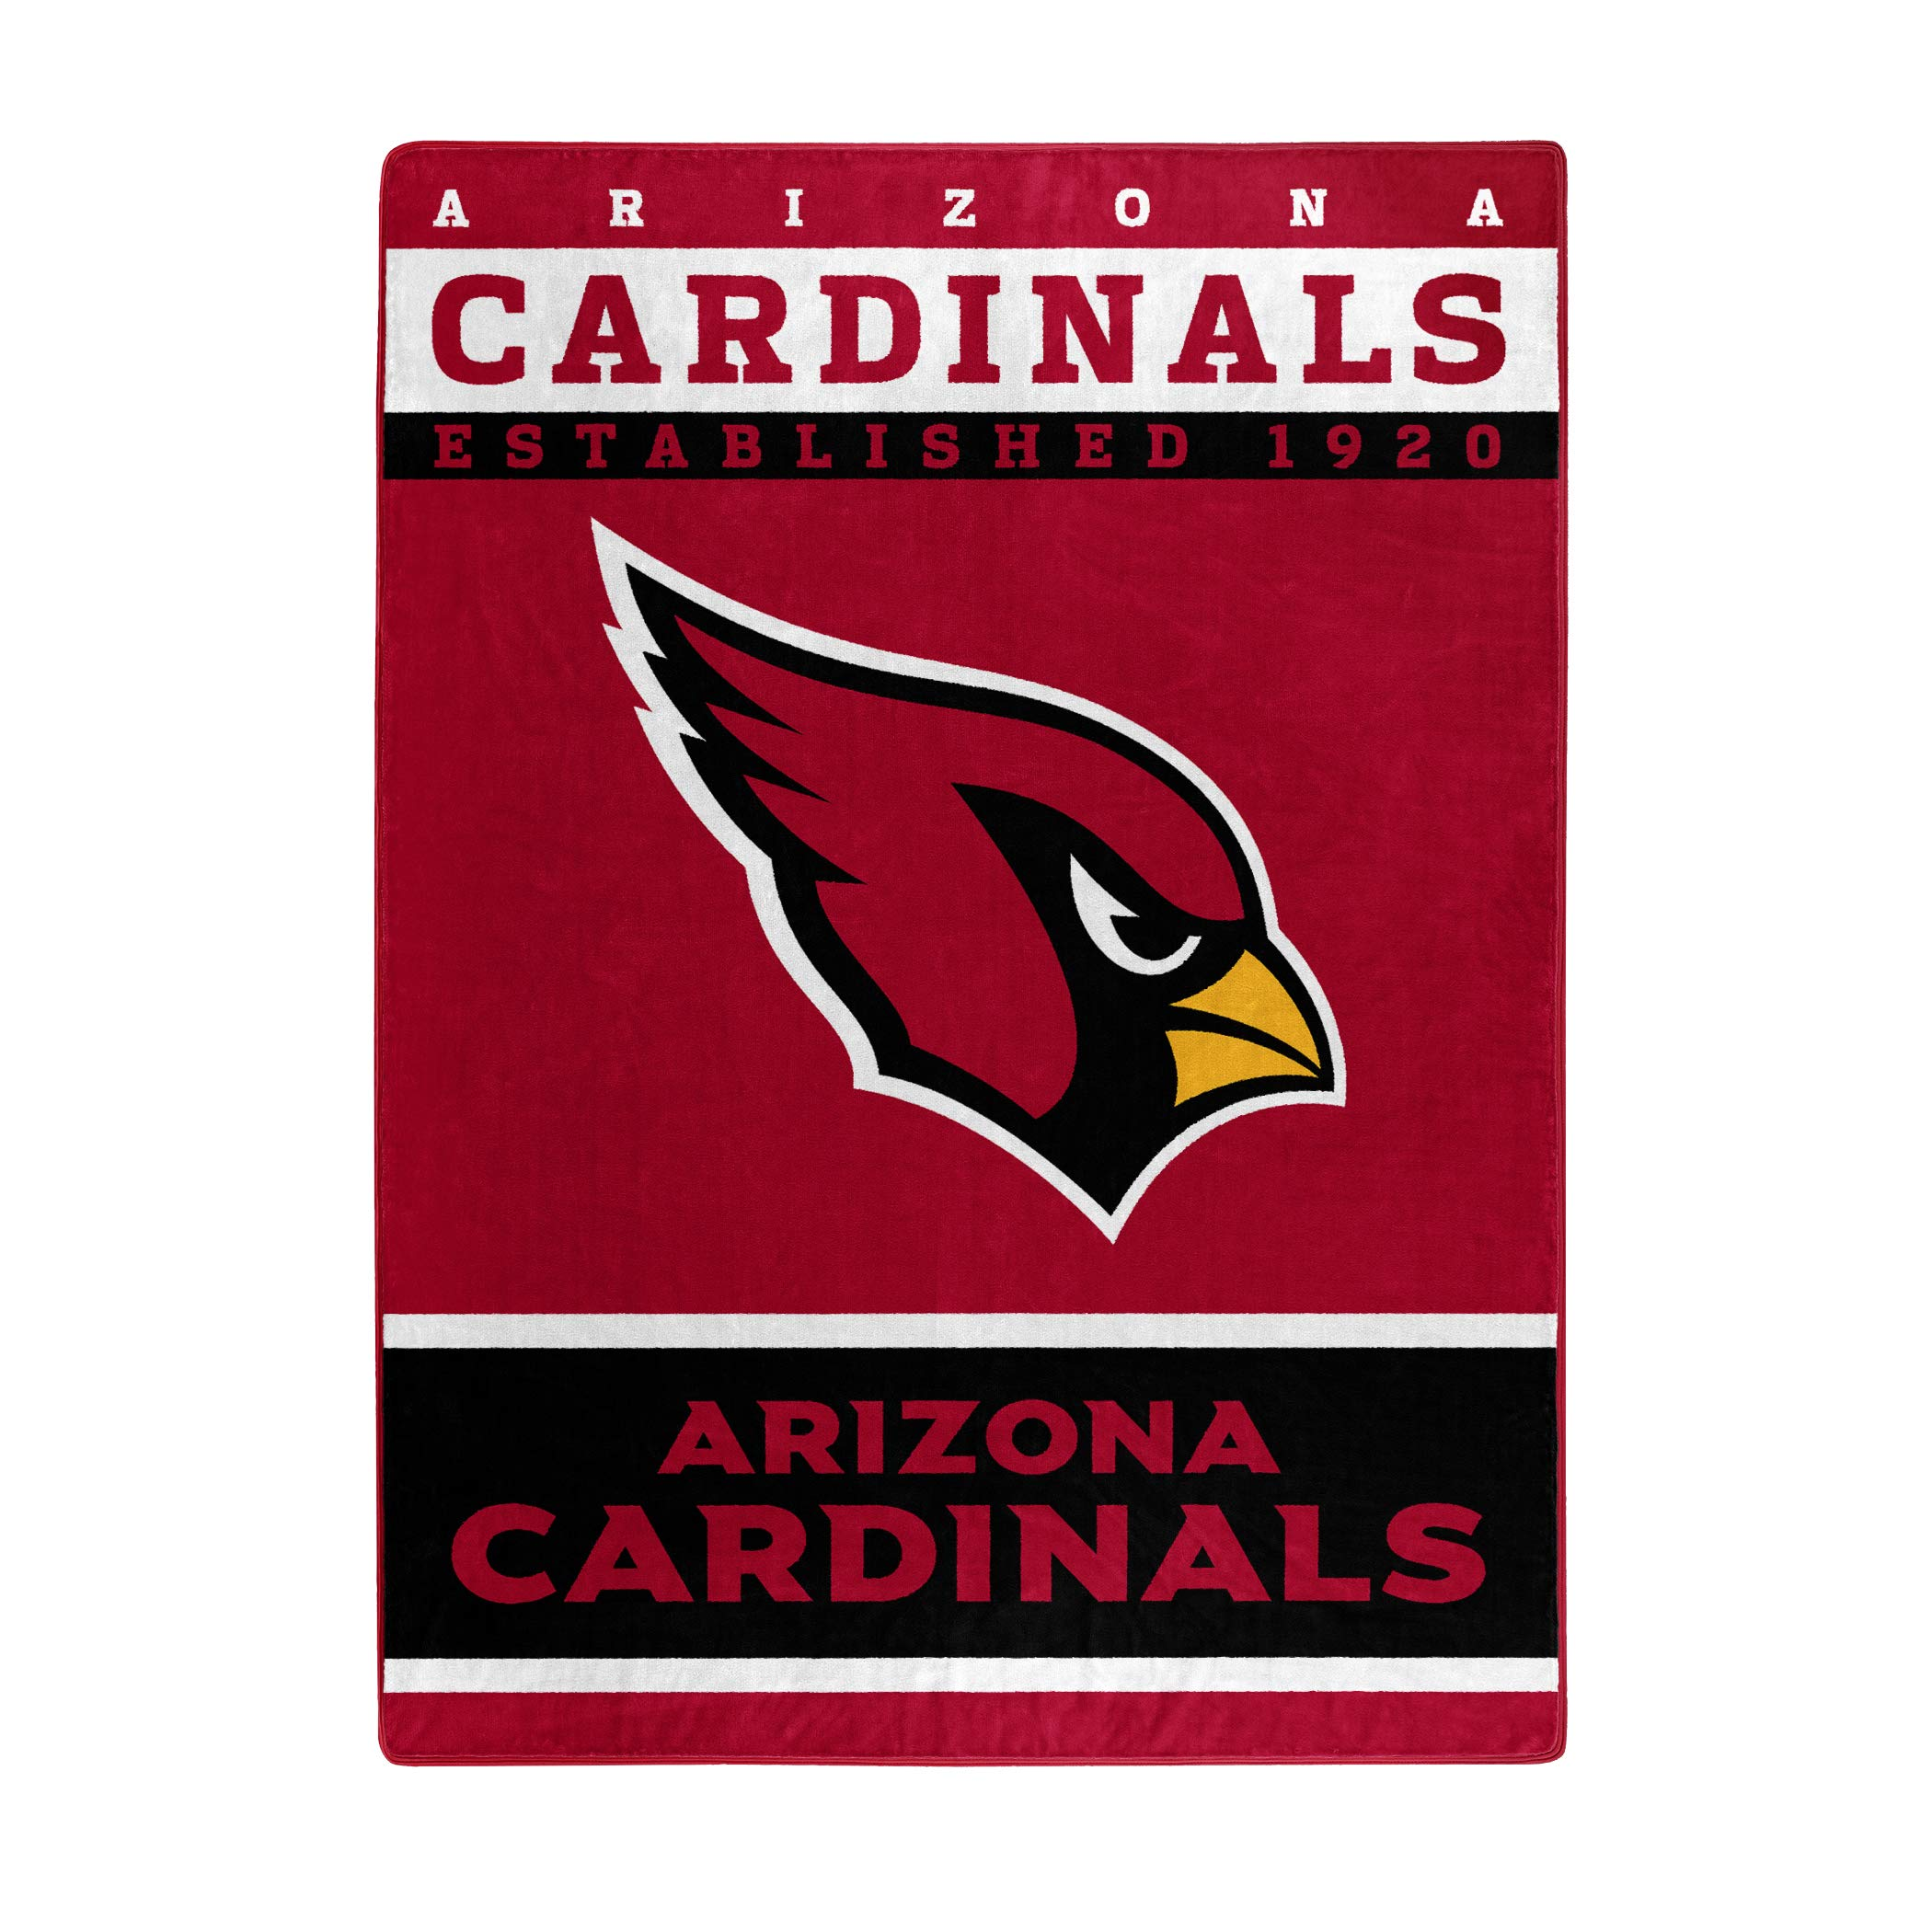 The Northwest Company Officially Licensed NFL Arizona Cardinals 12th Man Plush Raschel Throw Blanket, 60'' x 80''